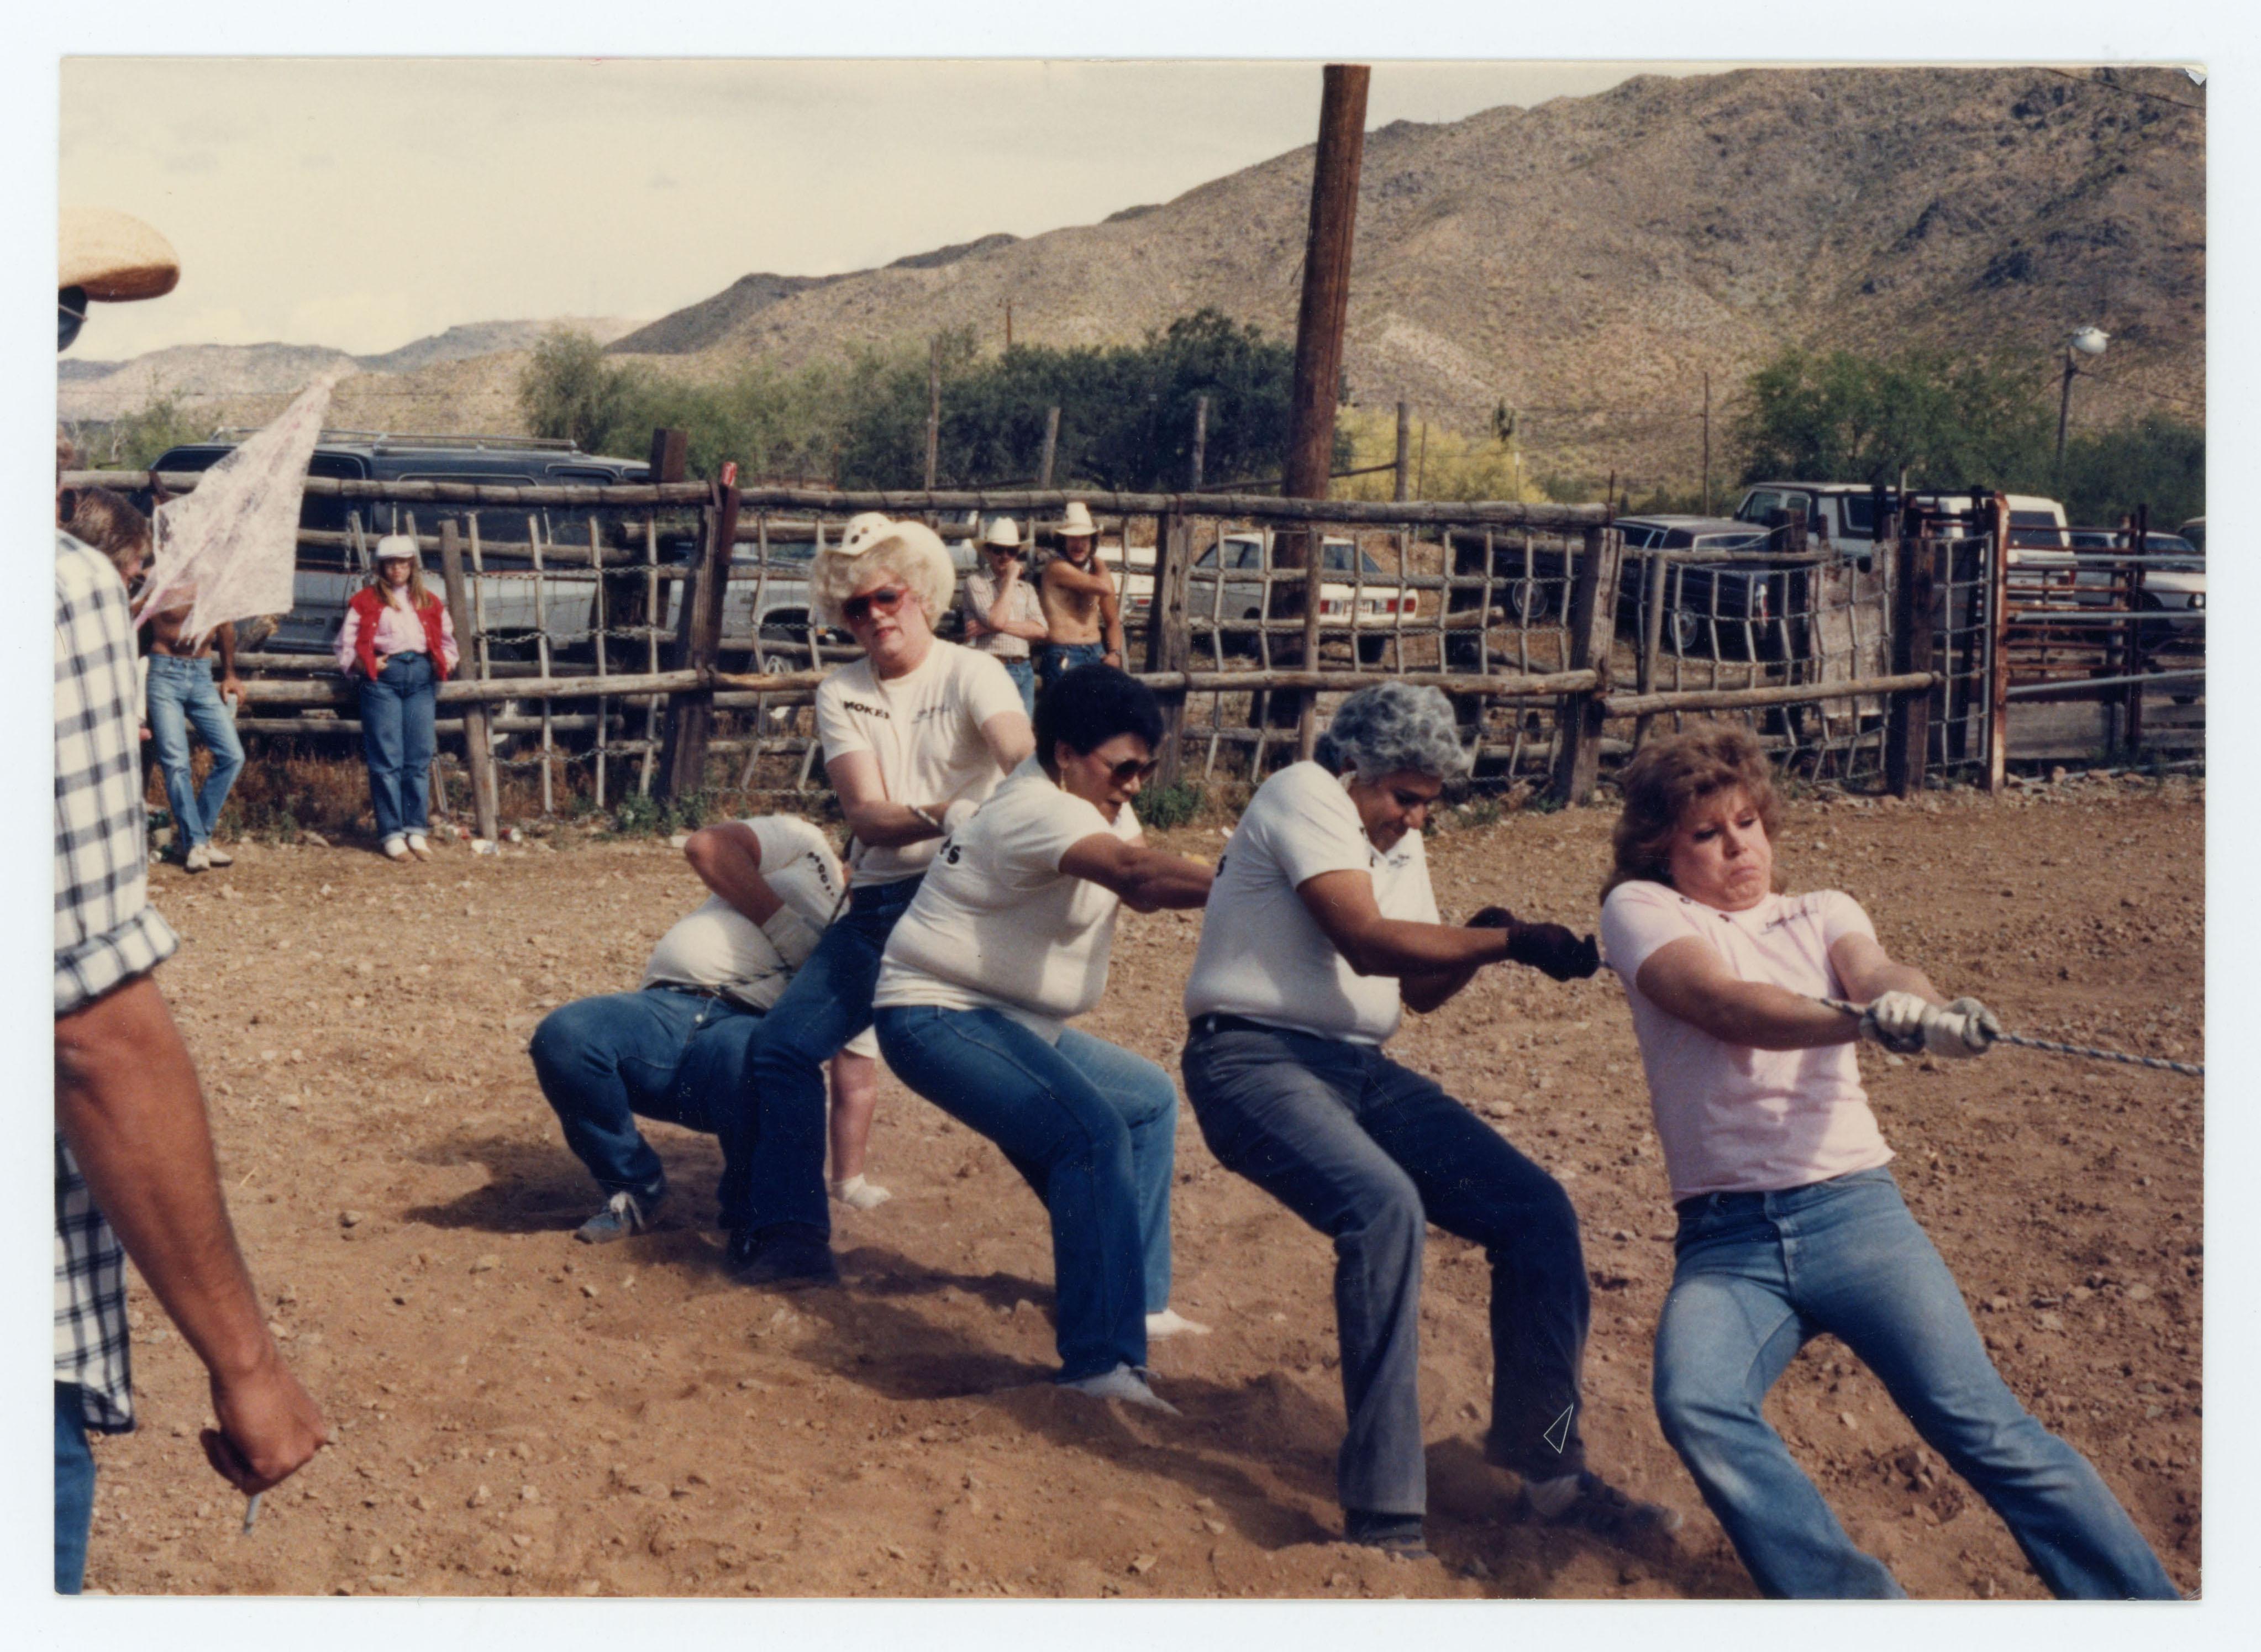 People playing tug o'war; Arizona Gay Rodeo Association; 1985